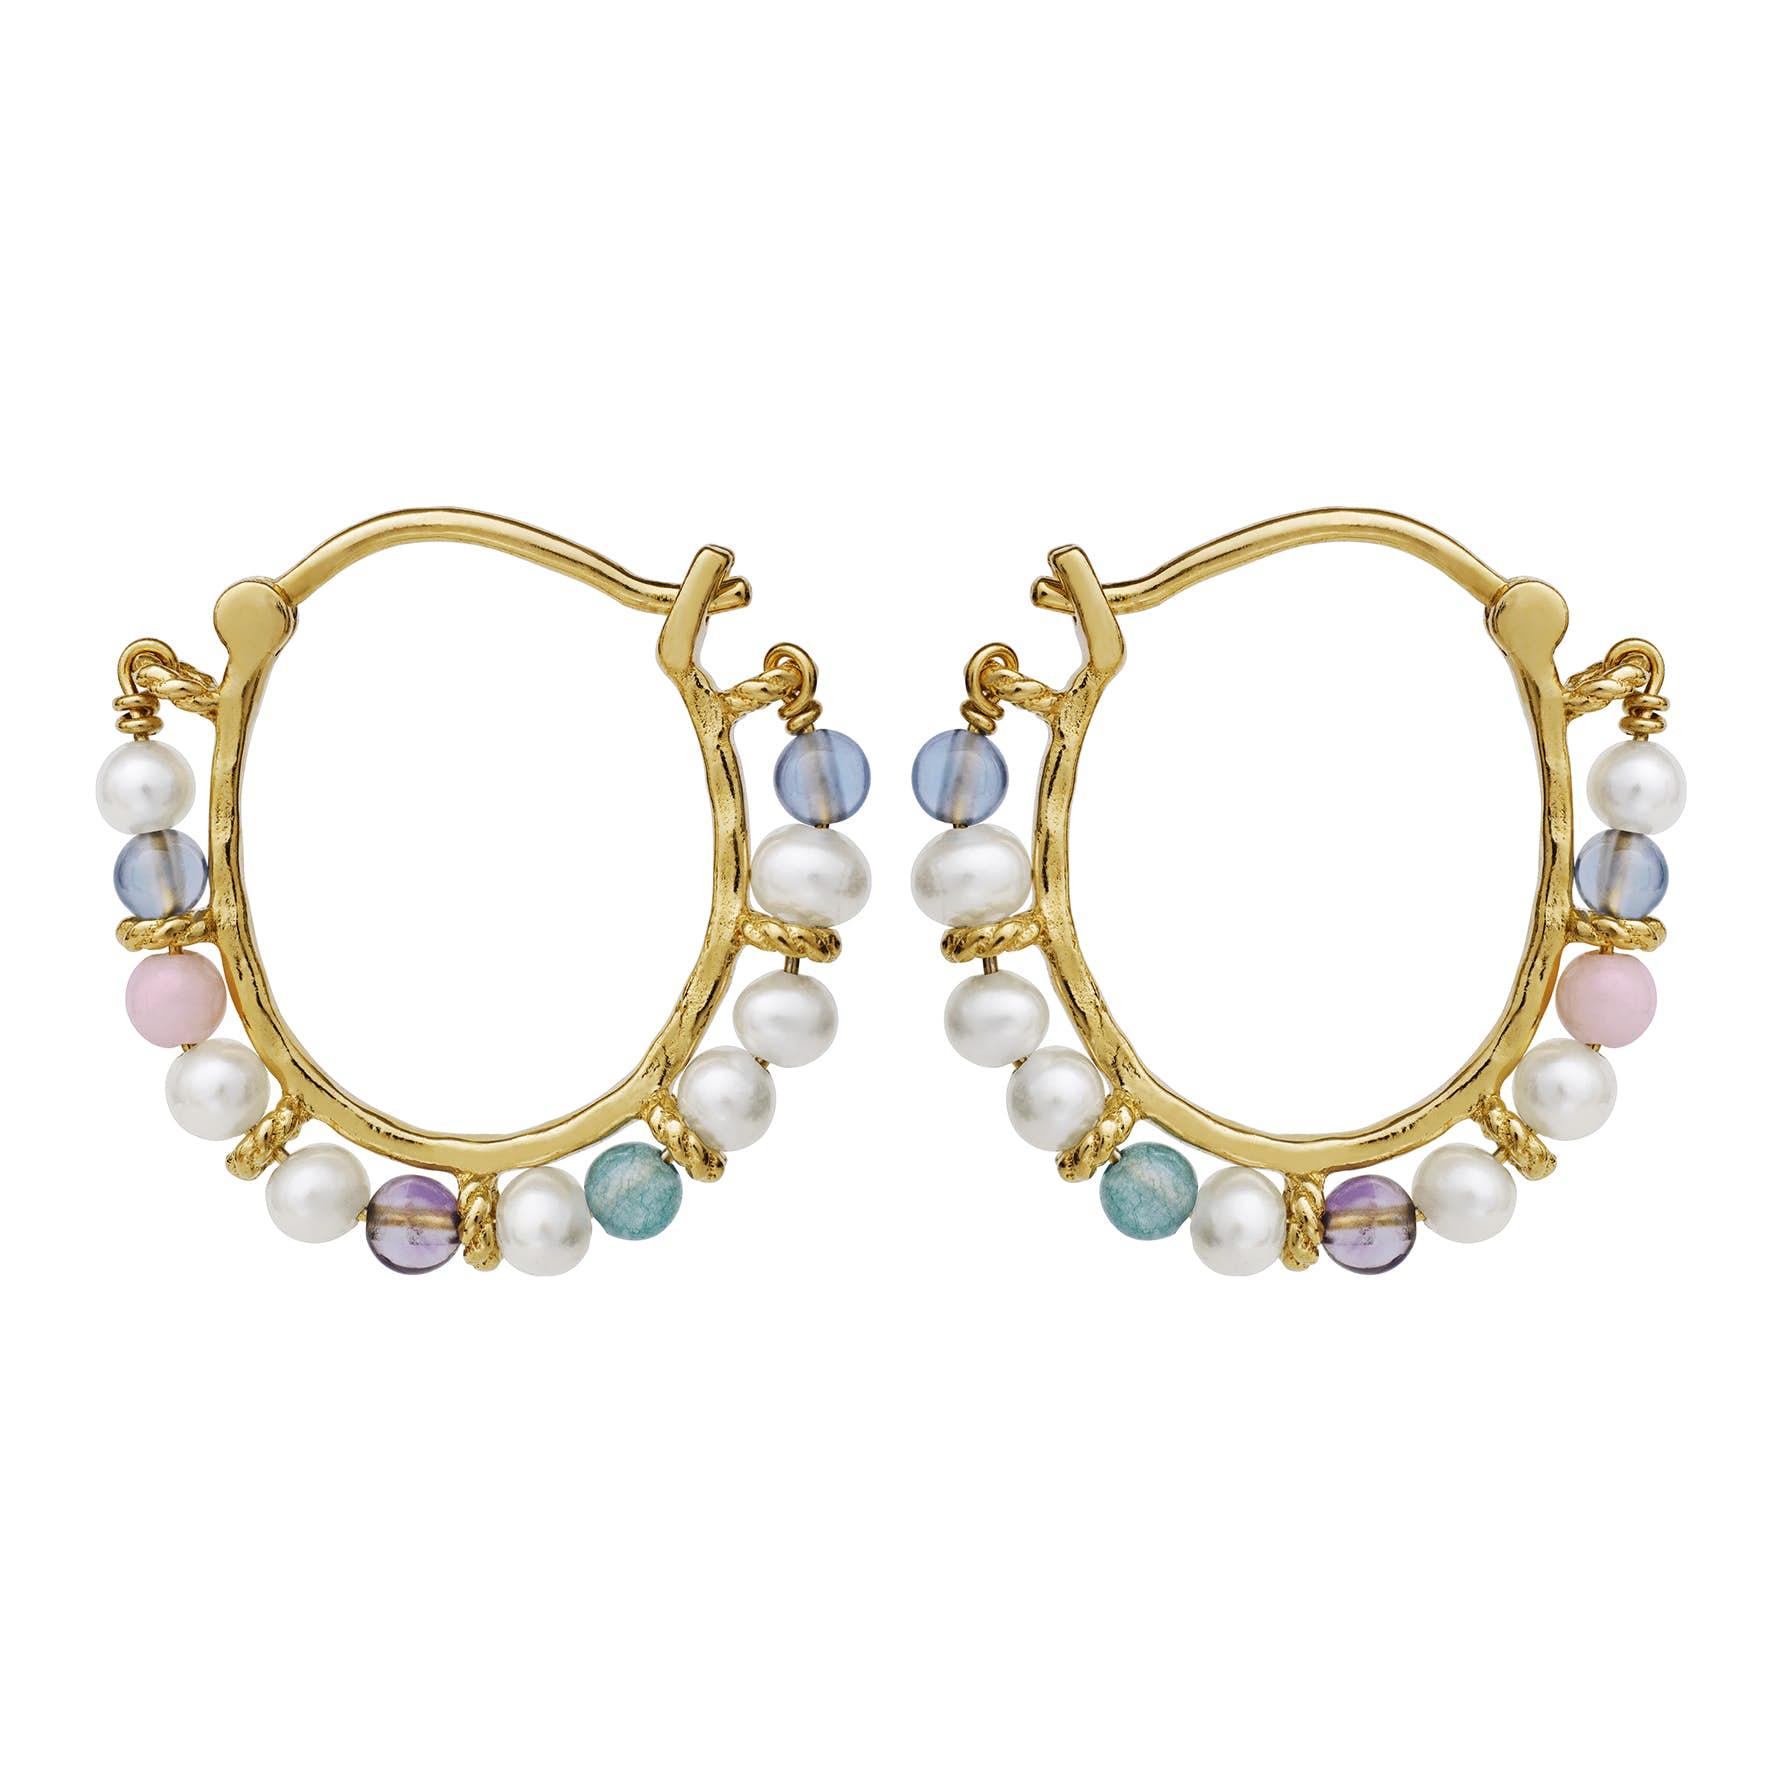 Phile Multi Earrings from Maanesten in Goldplated-Silver Sterling 925